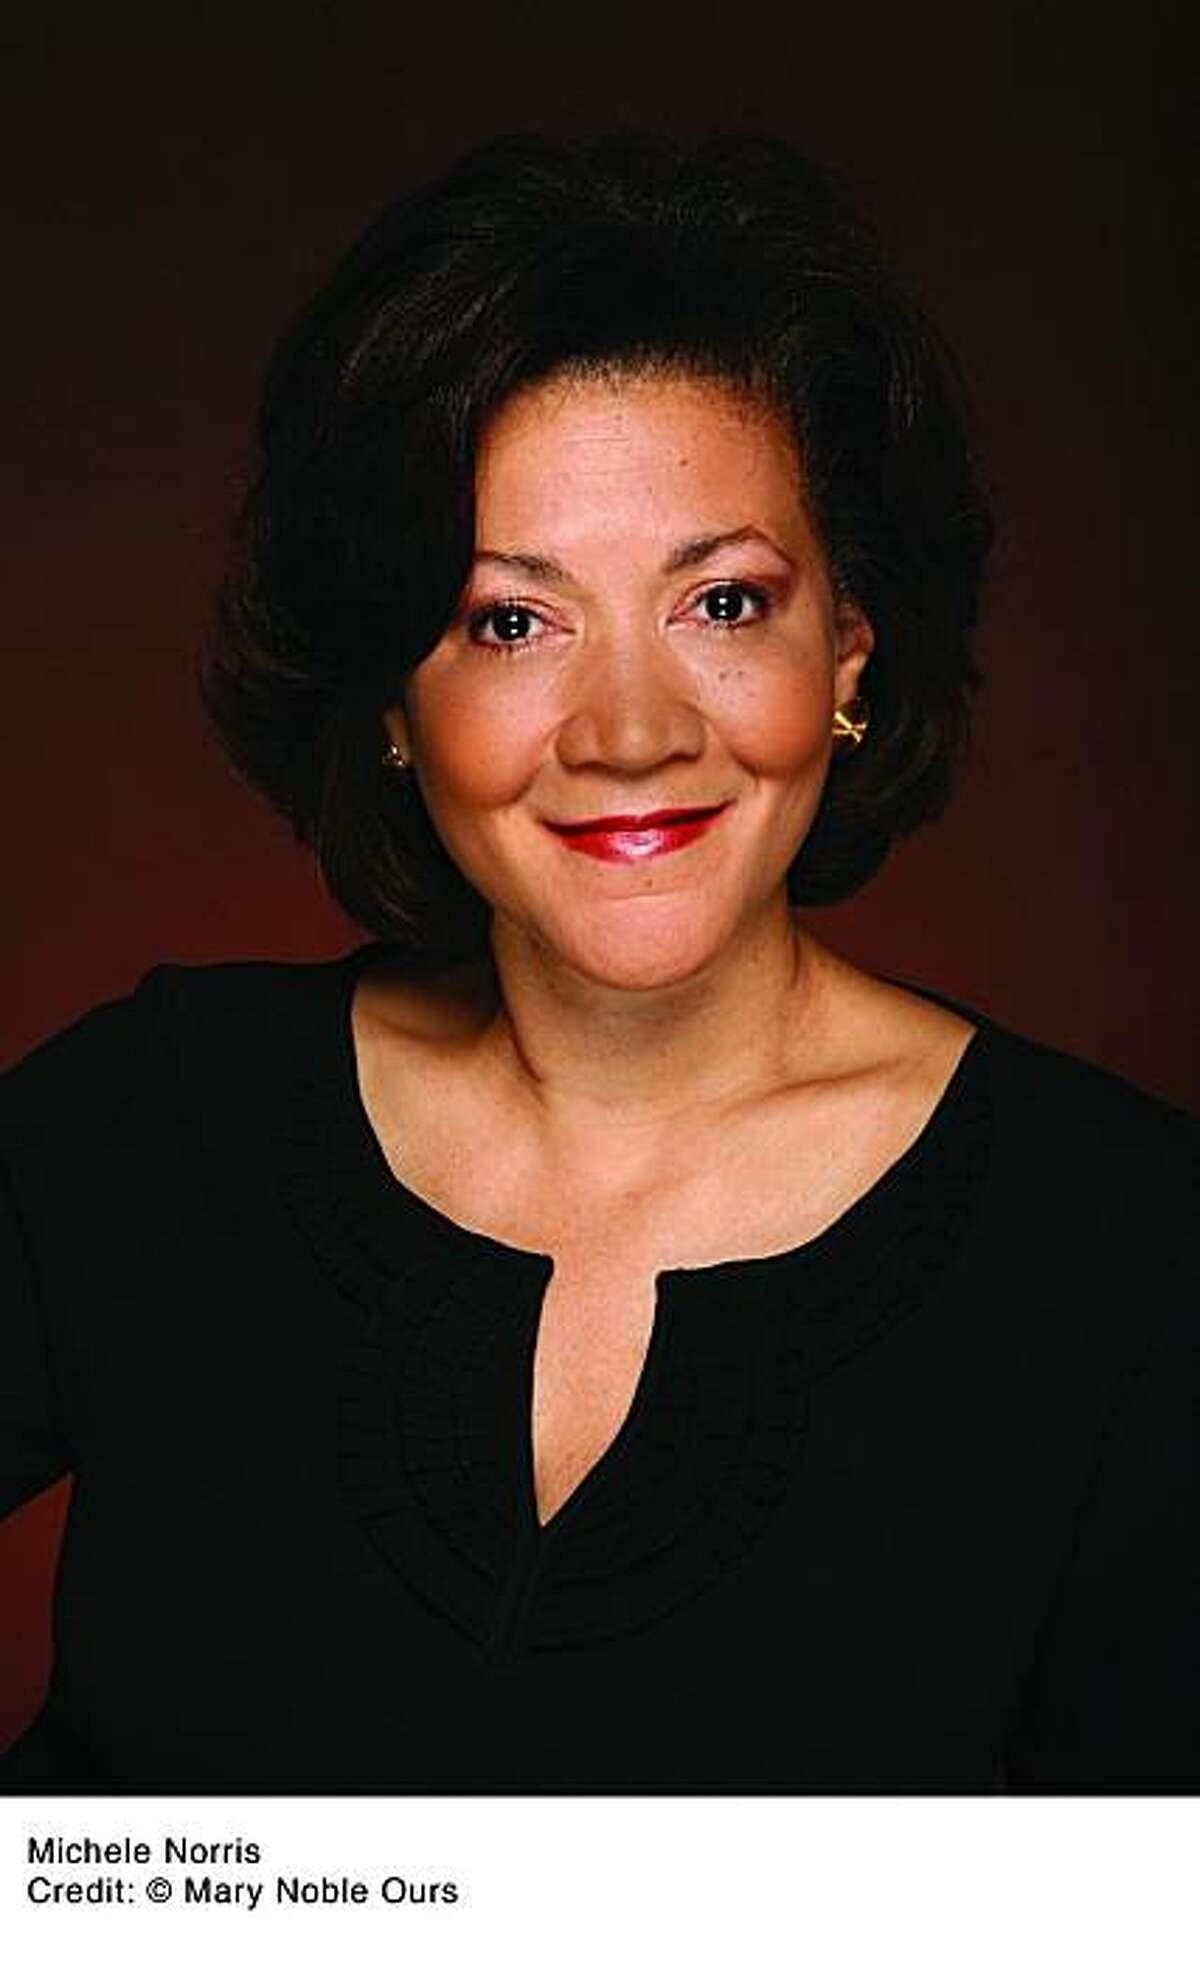 Michele Norris, author of